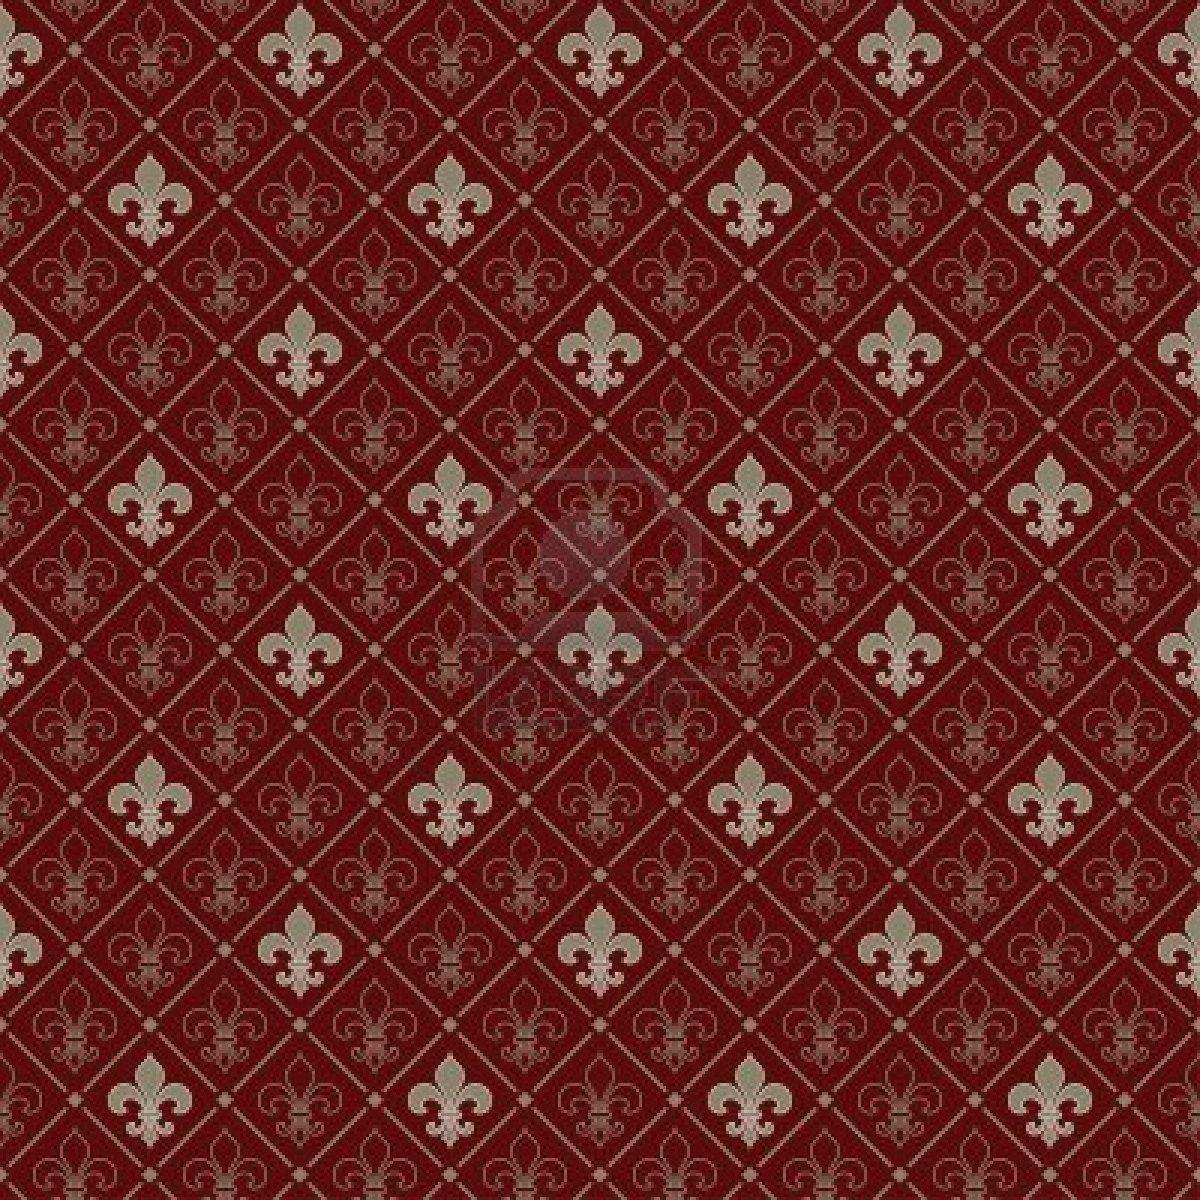 Stock Vector Pattern, Desktop wallpaper pattern